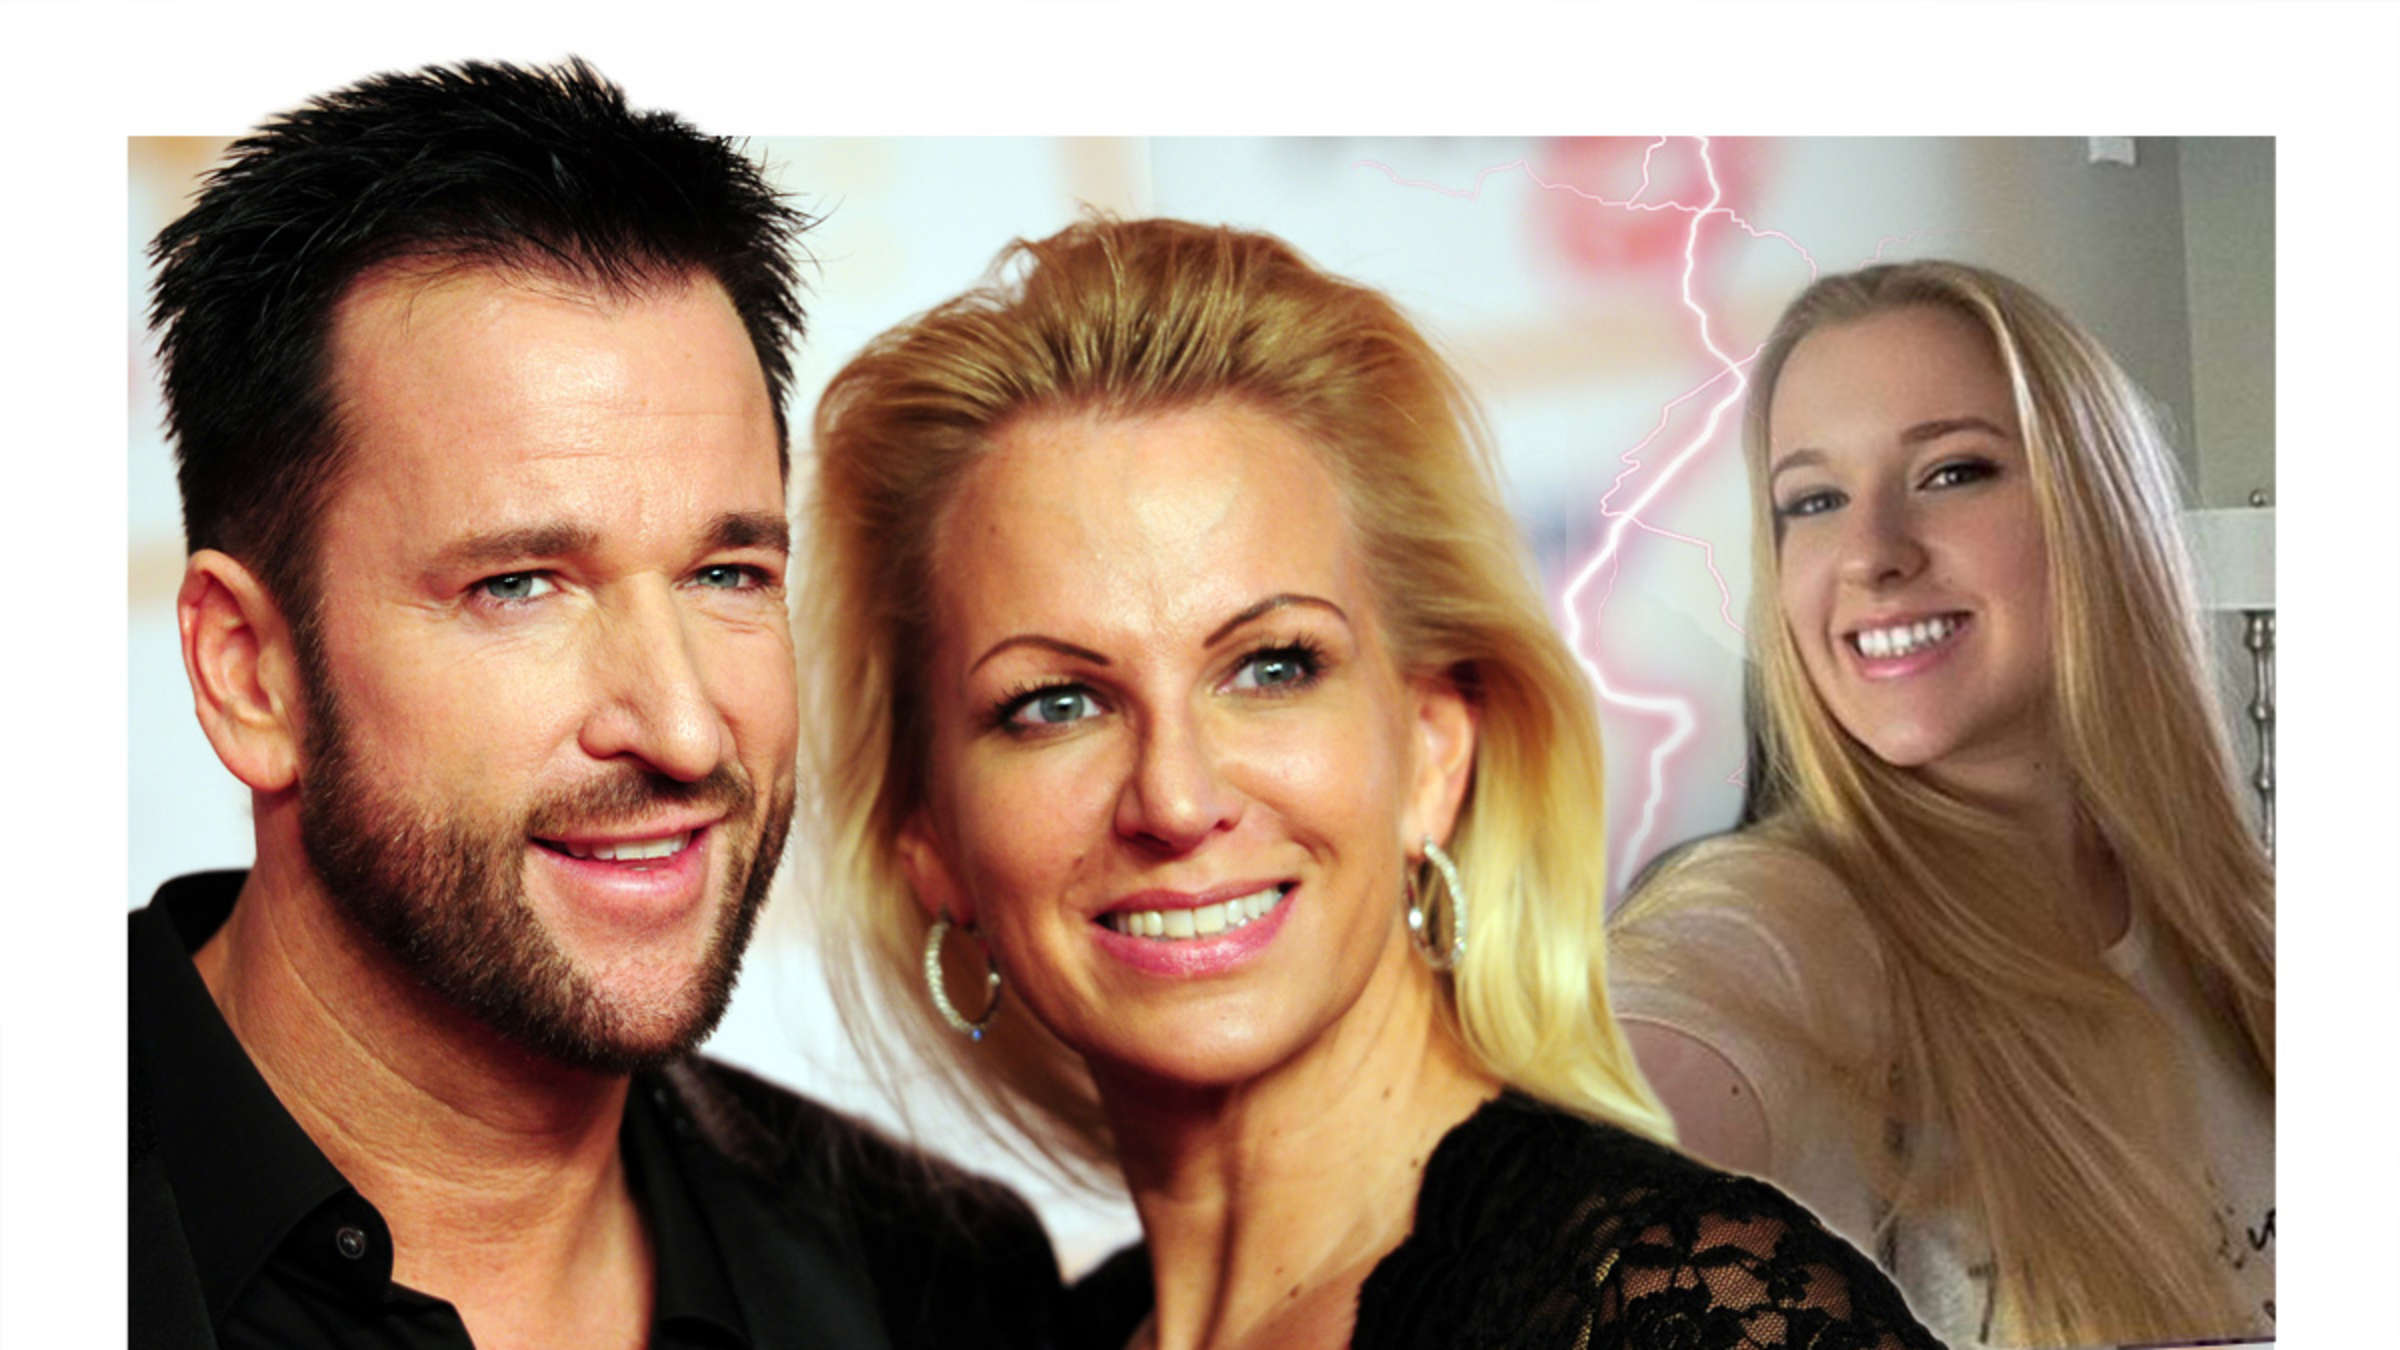 Dschungelcamp 2020 Ibes Wendler Ex Claudia Norberg Verrat Trauriges Geheimnis Uber Tochter Fanbase